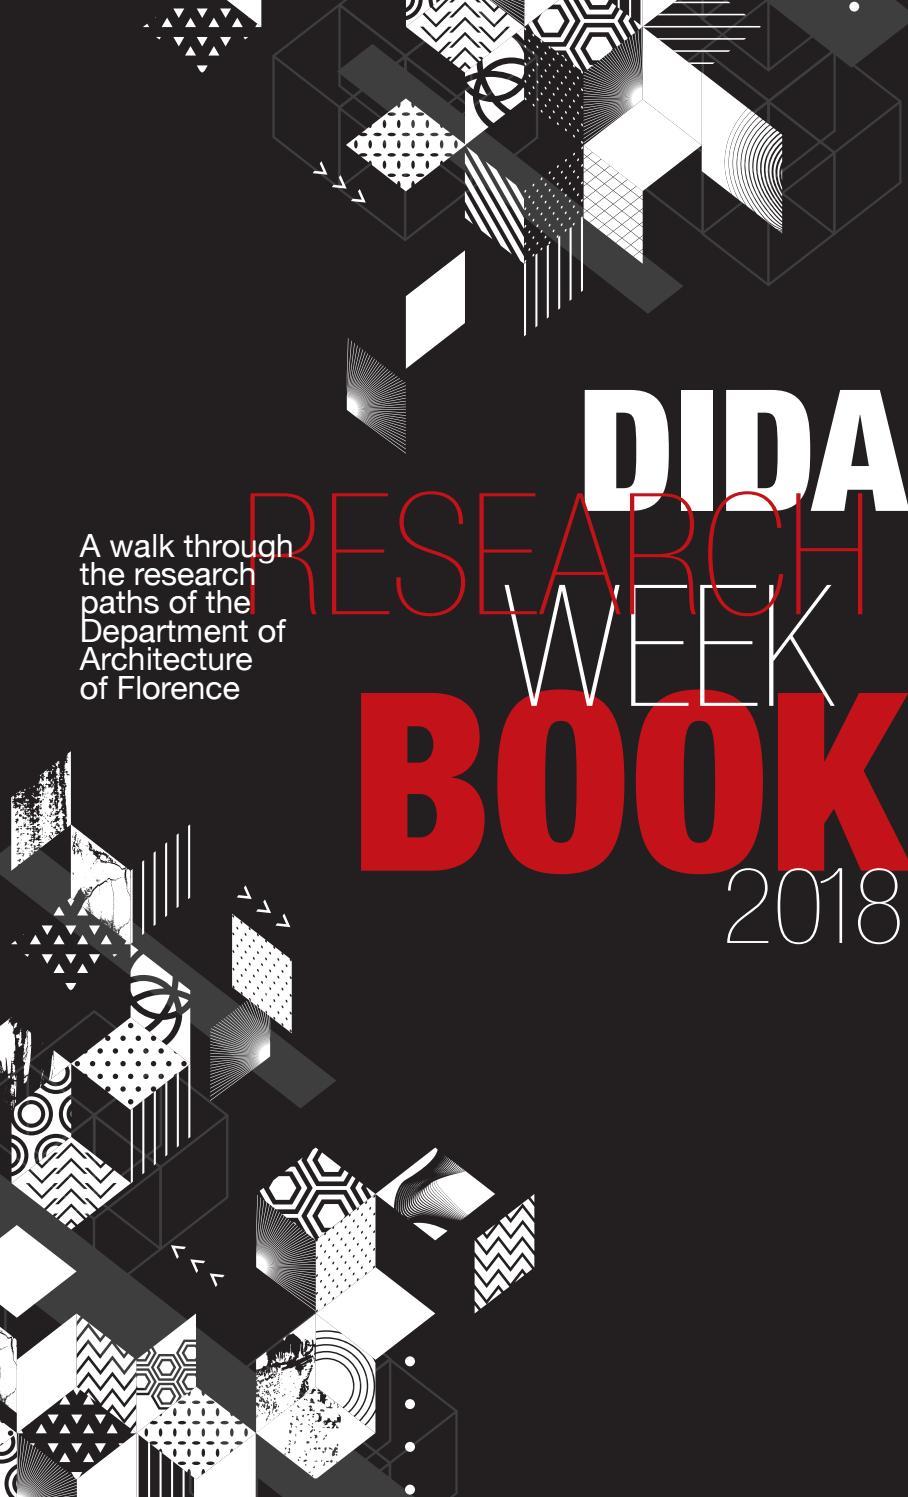 Negli anni '70 lavora a. Dida Research Week Book By Dida Issuu